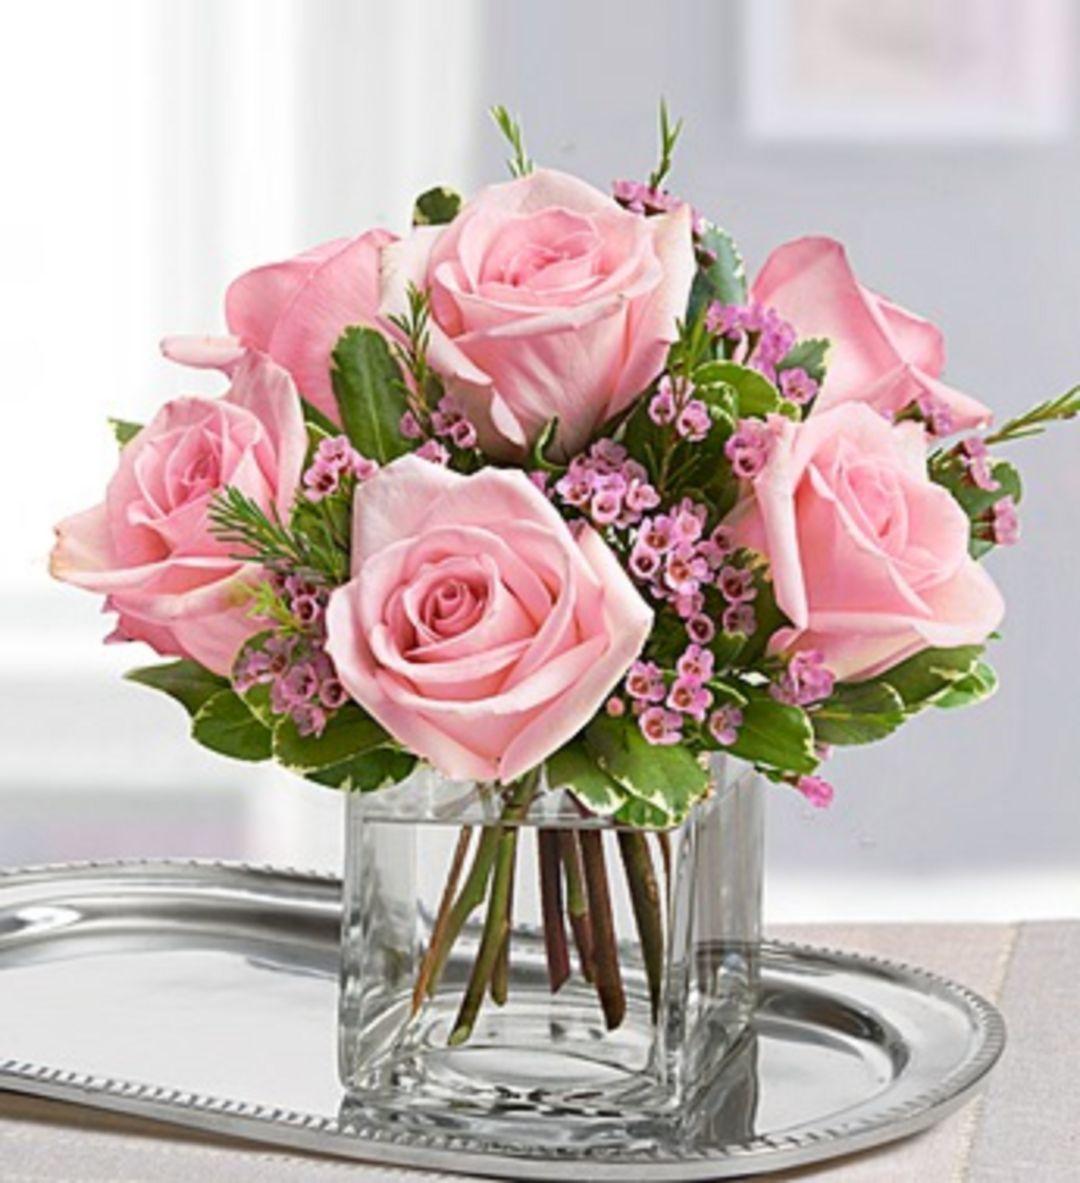 картинки розы в азе пара